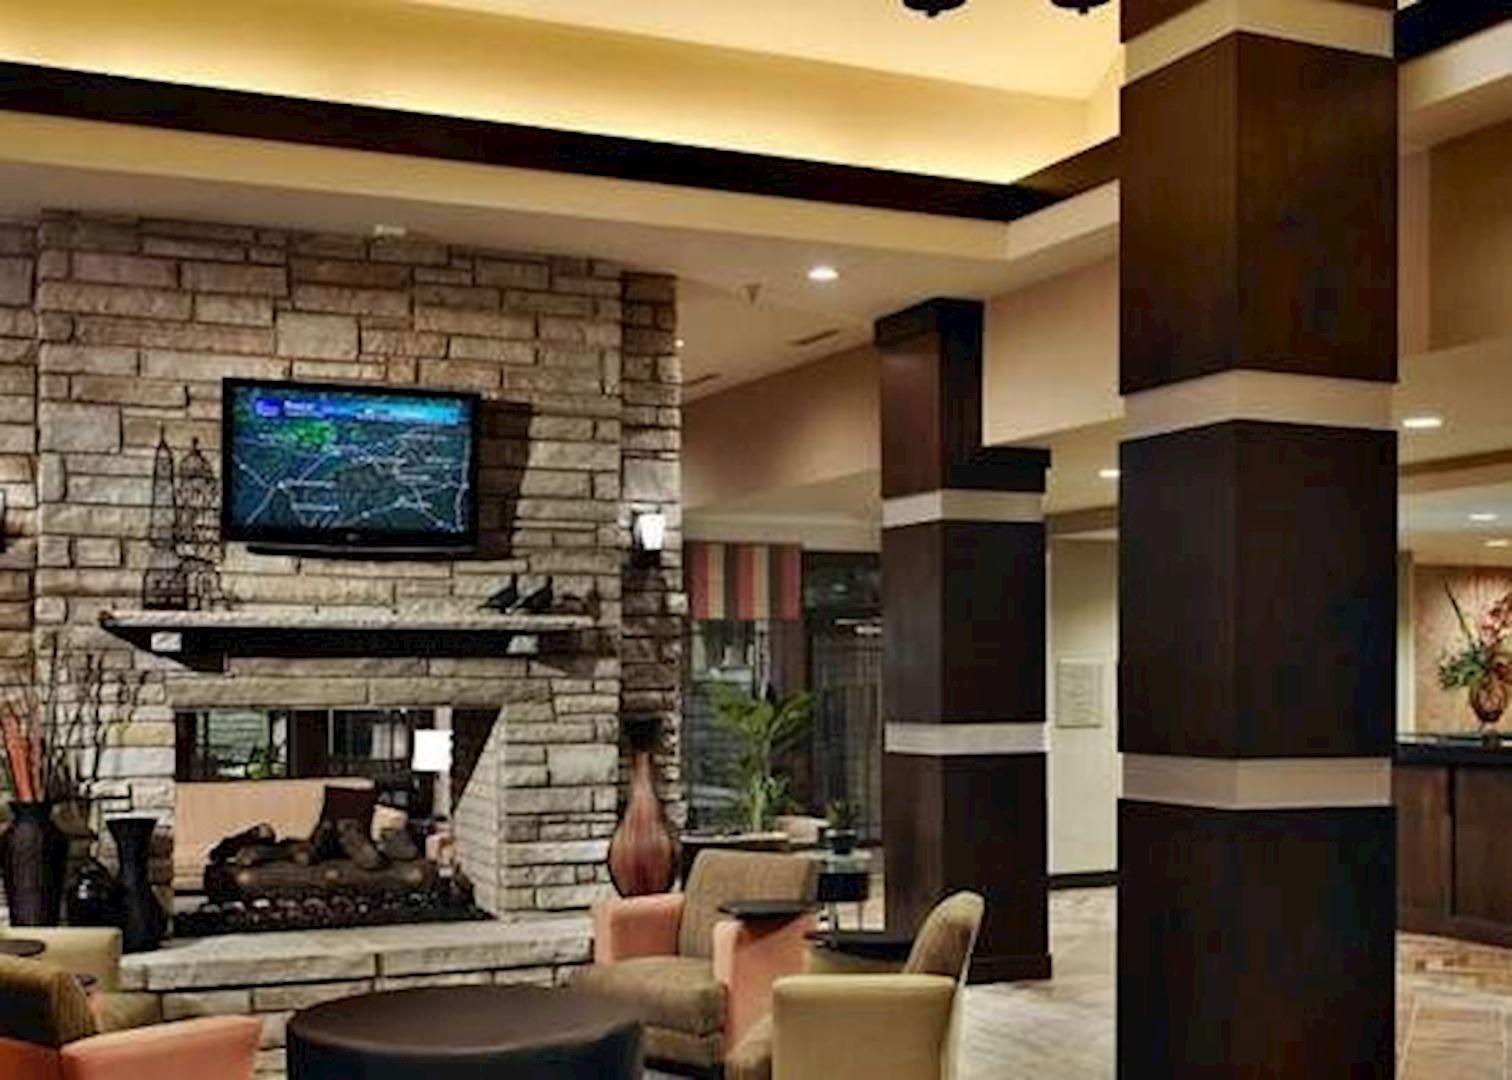 Hilton Garden Inn | Hotels in The USA | Audley Travel